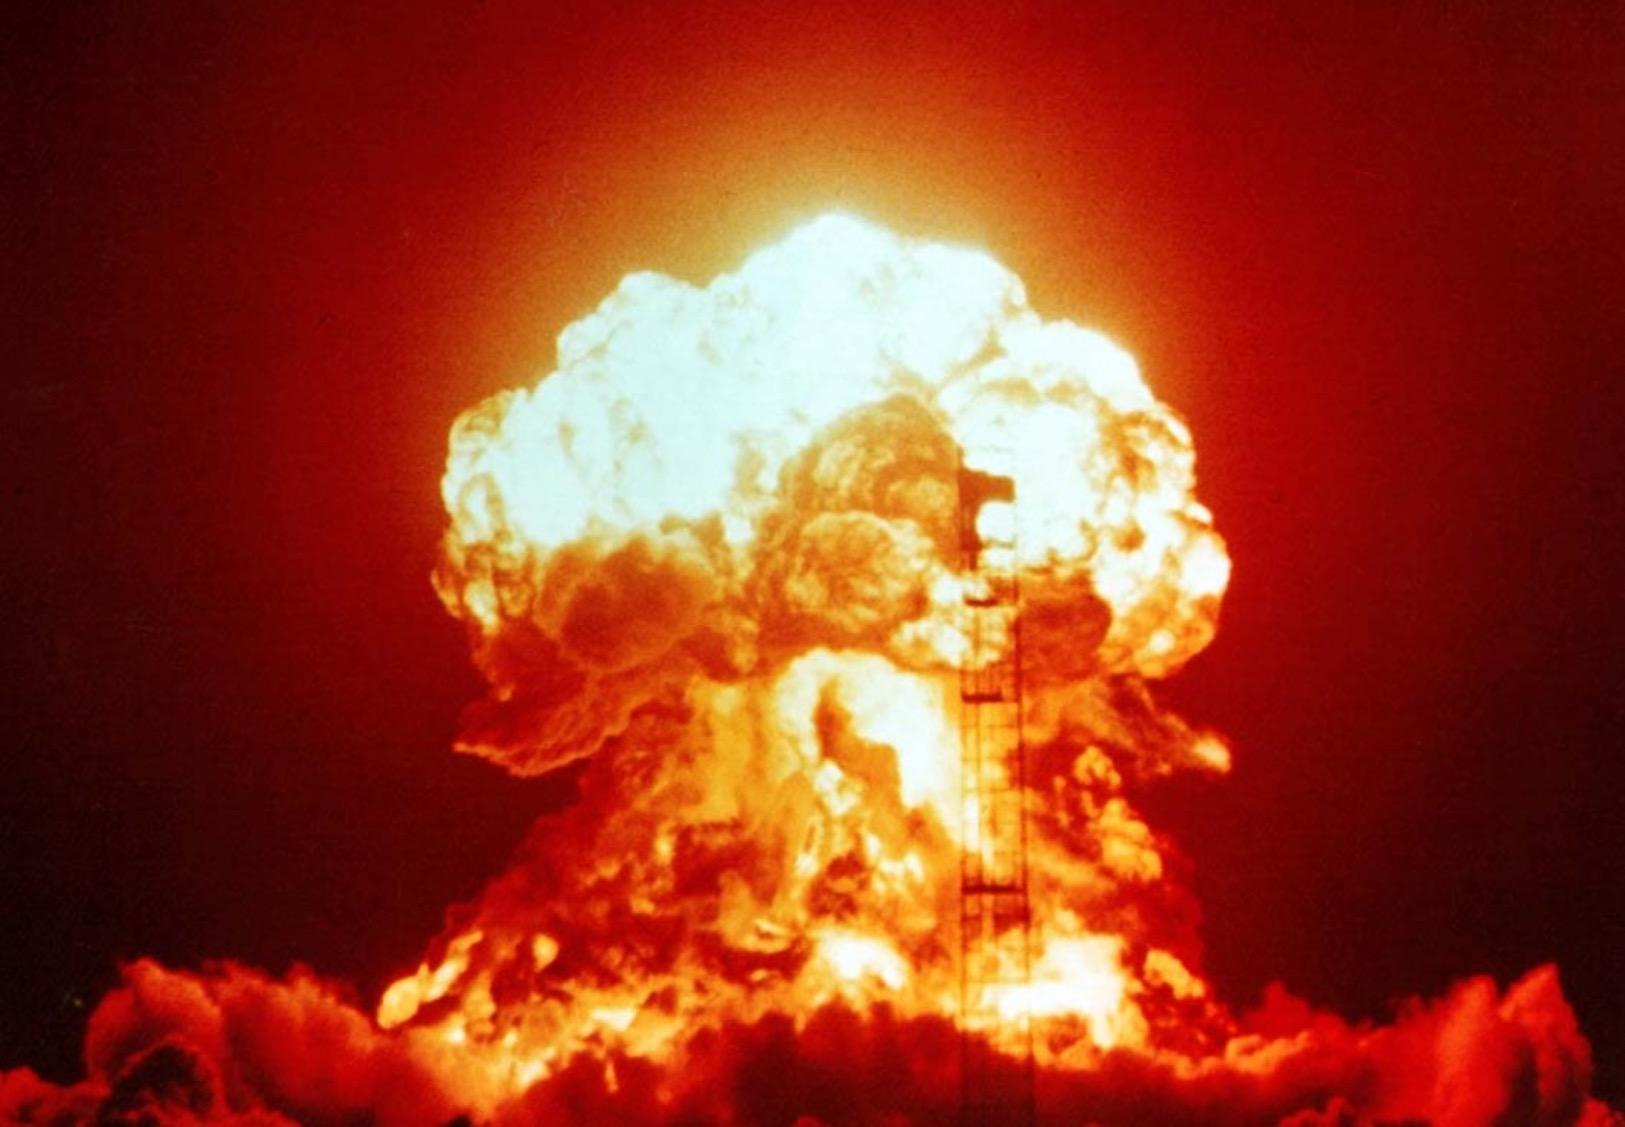 Explosión nuclear (Wikicommons)